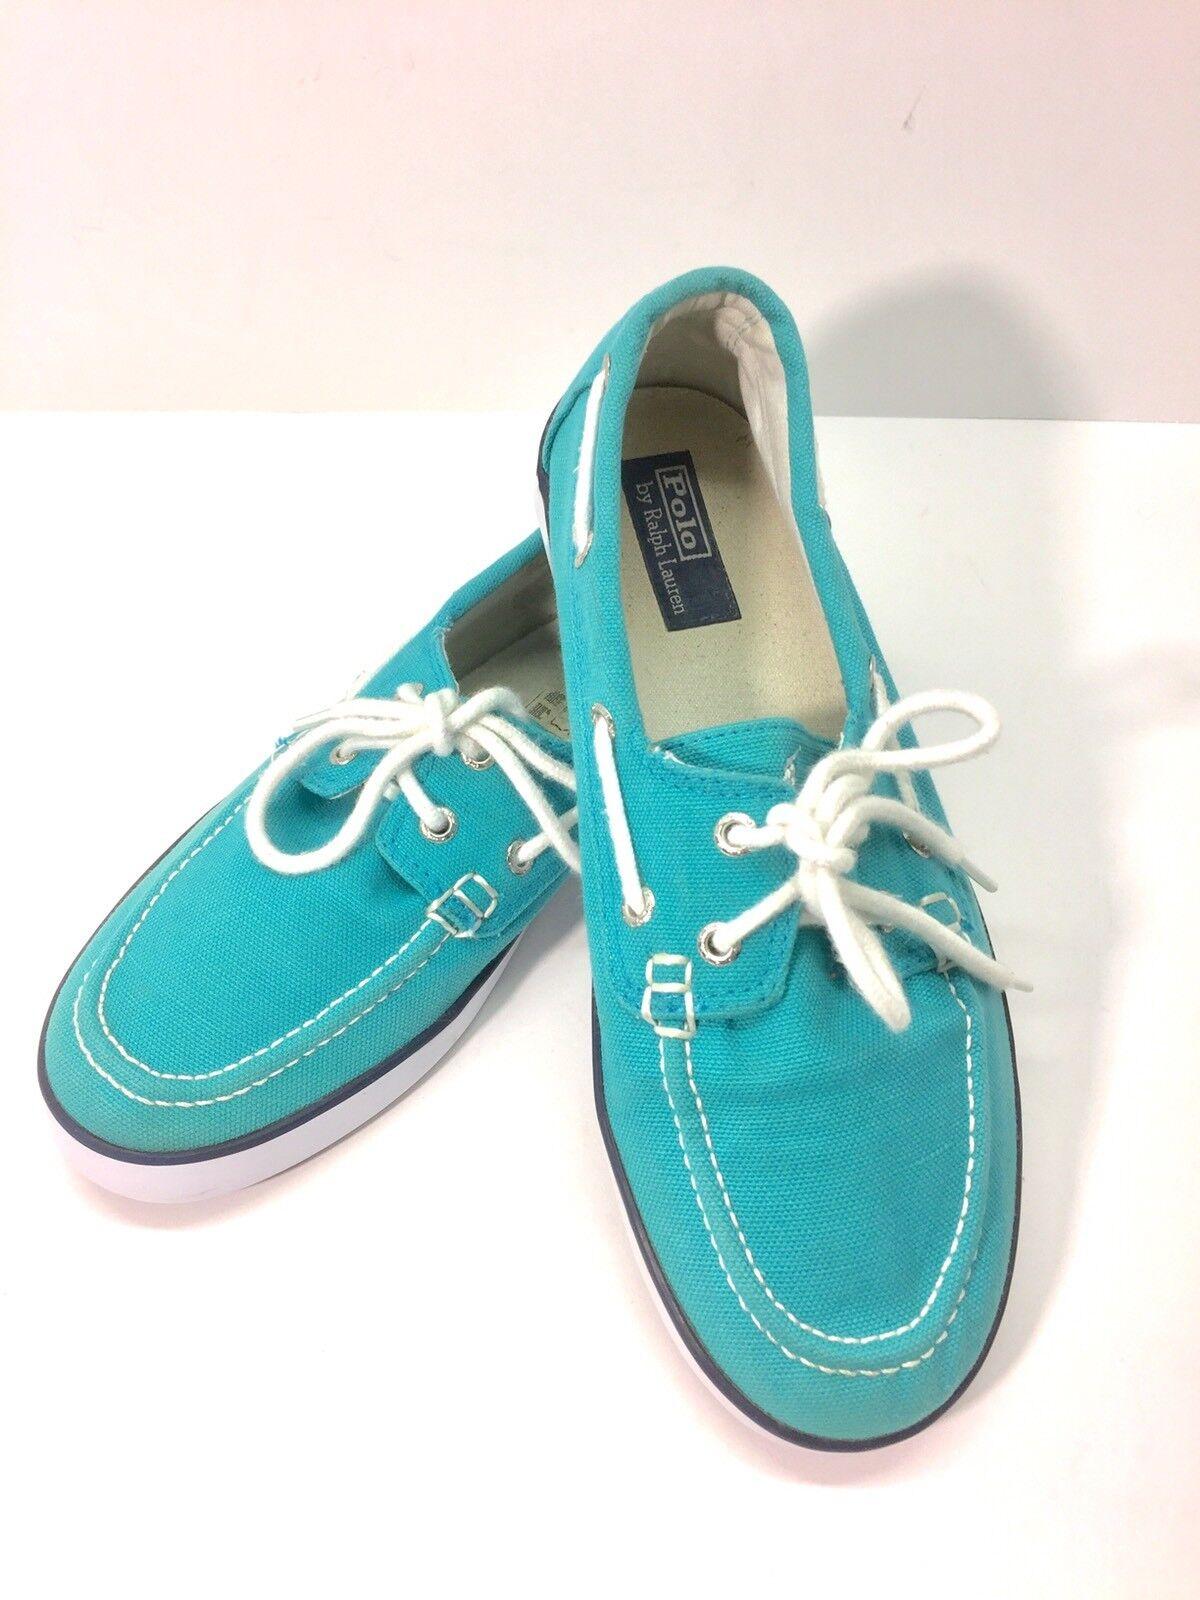 Polo Ralph Lauren Womens Sander Boat Sneaker Top-Sider 1/2 Shoe Canvas Size 5 1/2 Top-Sider b8f7c6